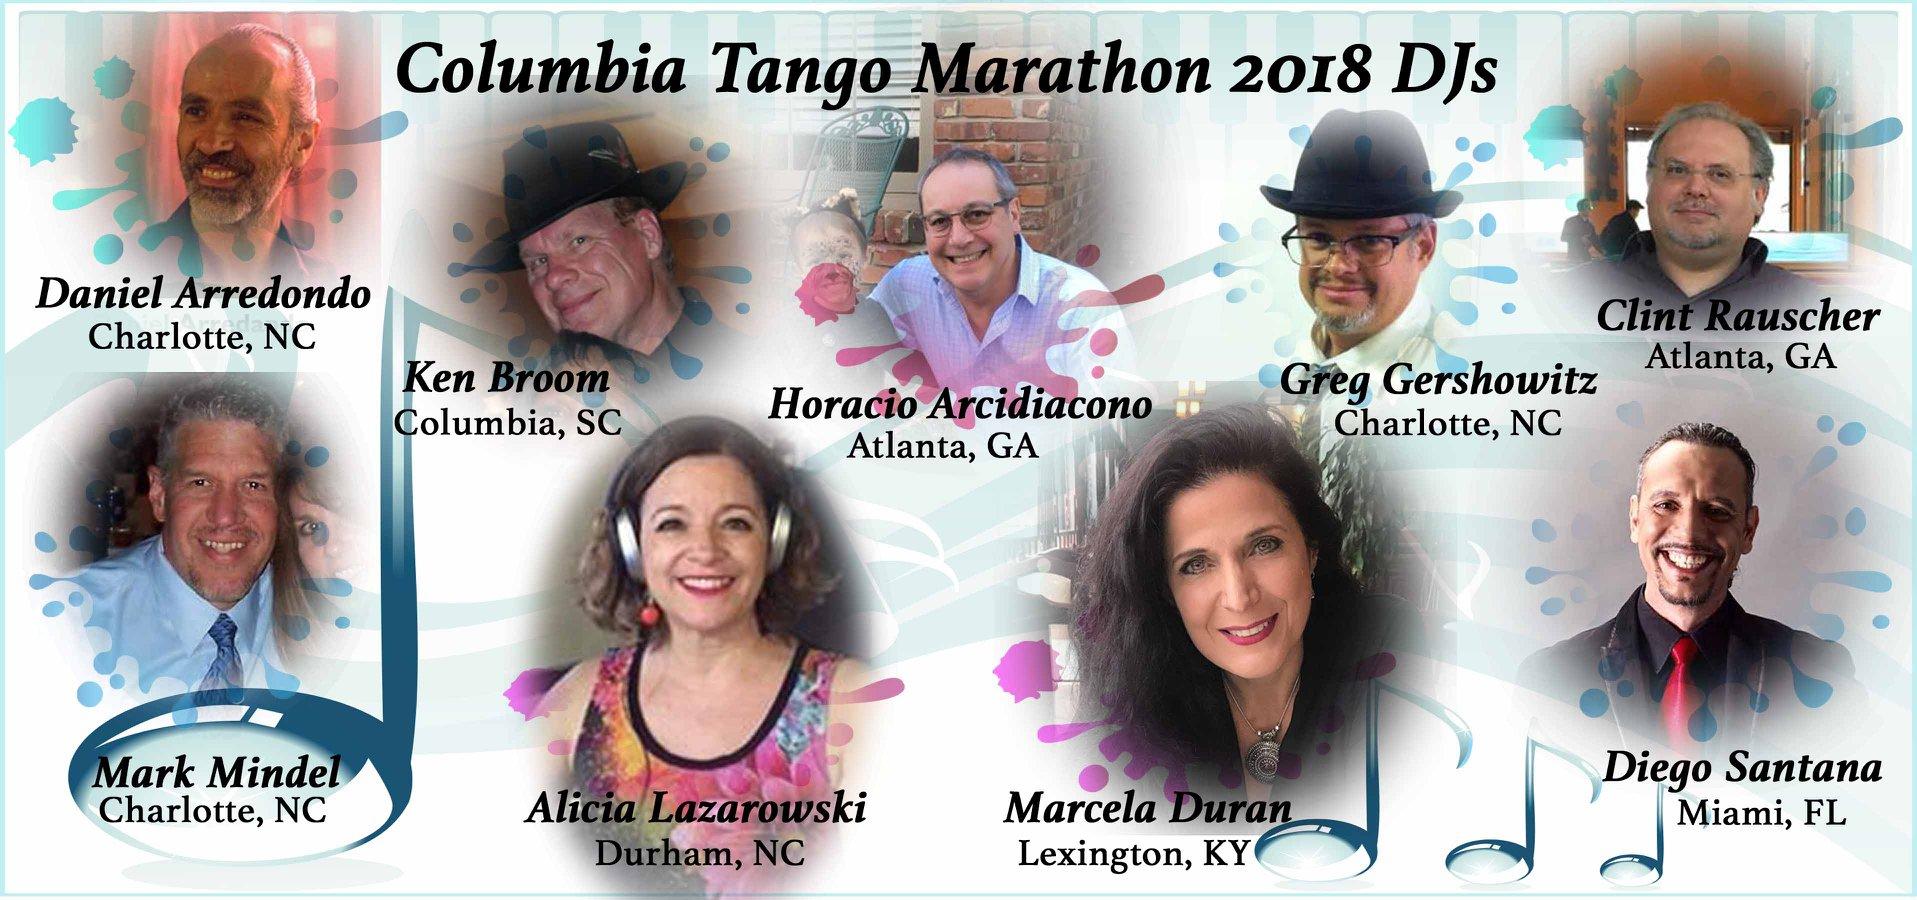 Columbia Tango Marathon 2018